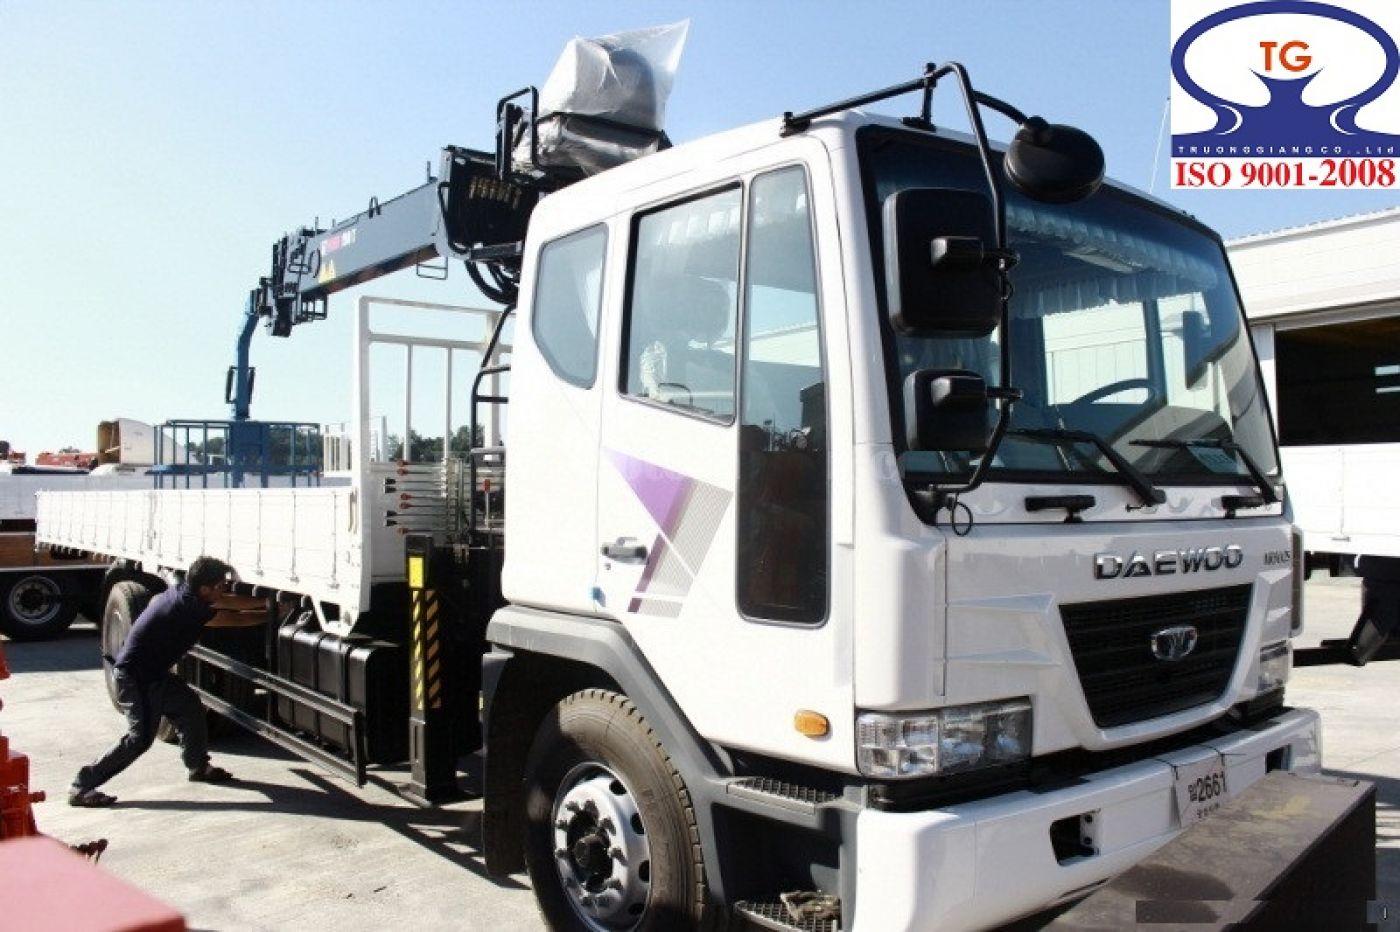 xe-cẩu-tự-hành-daewoo-k7cef